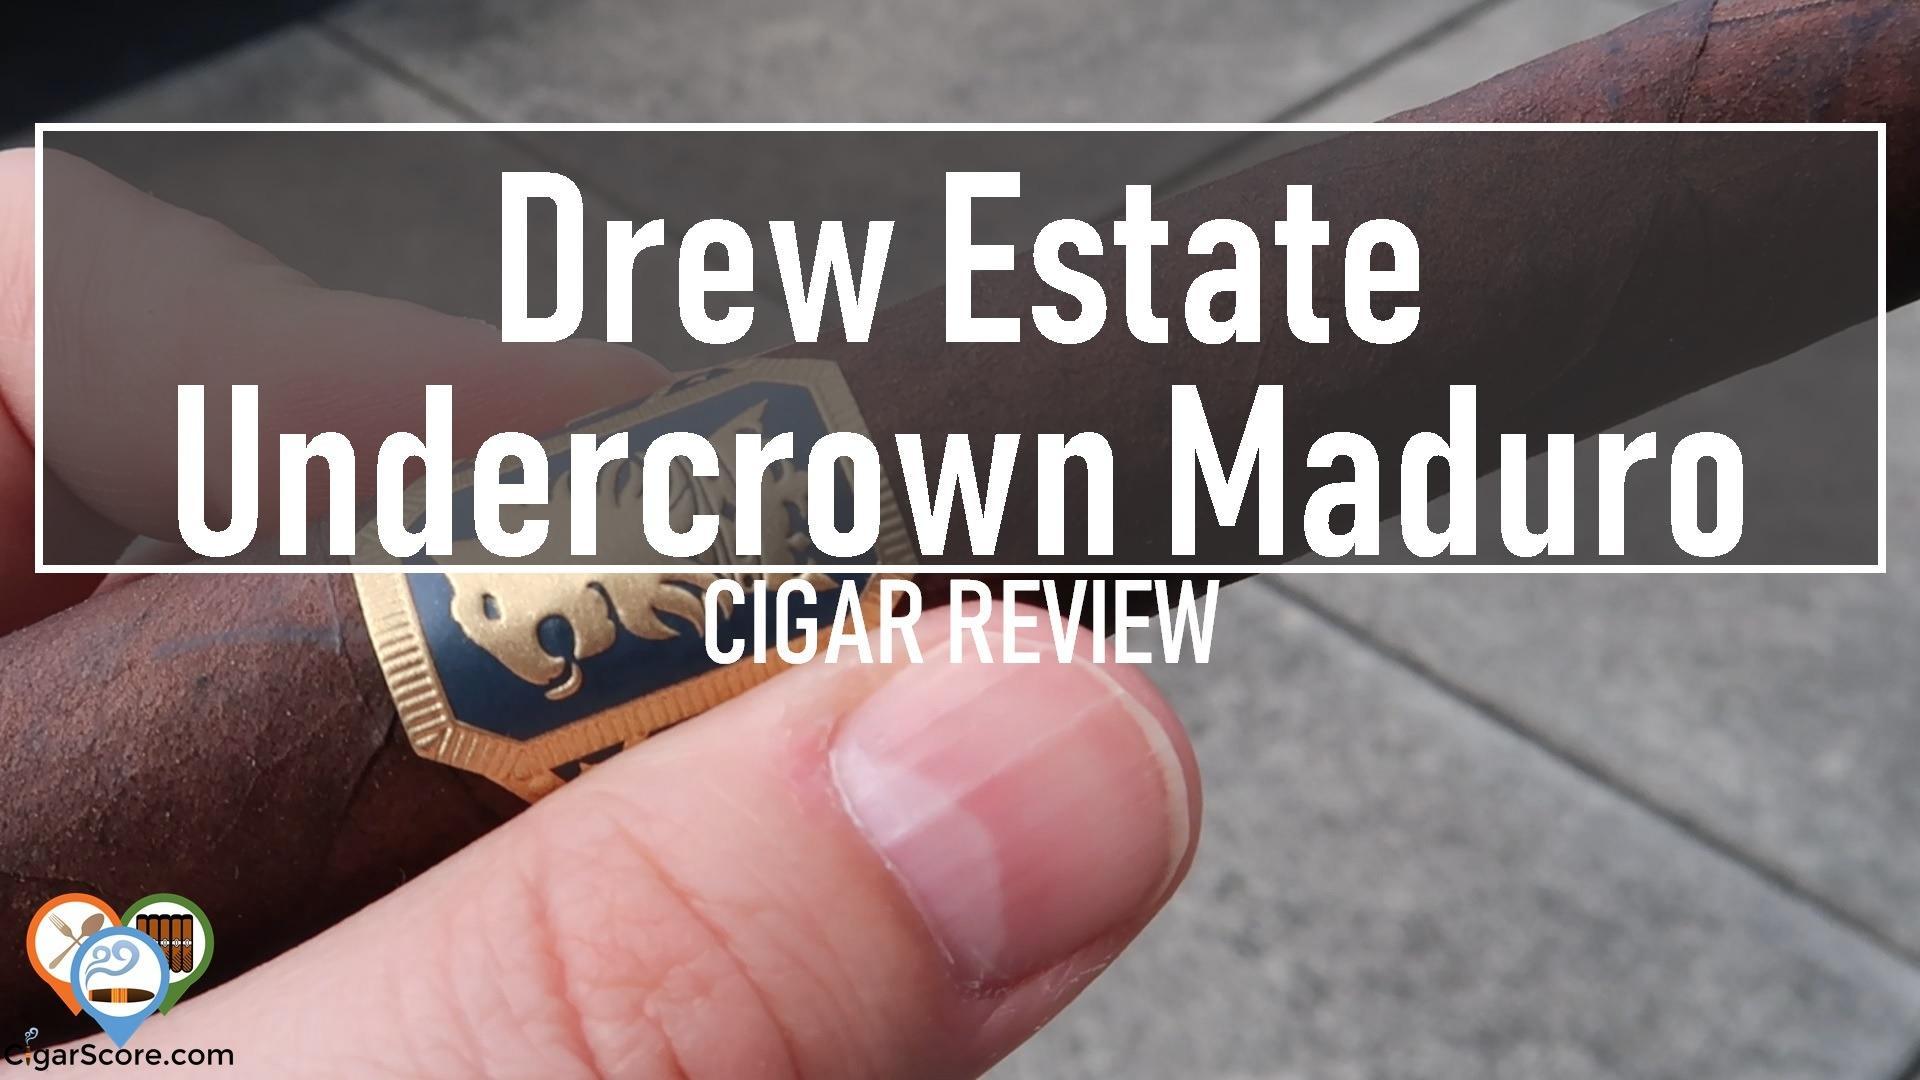 cigar review - drew estate undercrown maduro gran toro